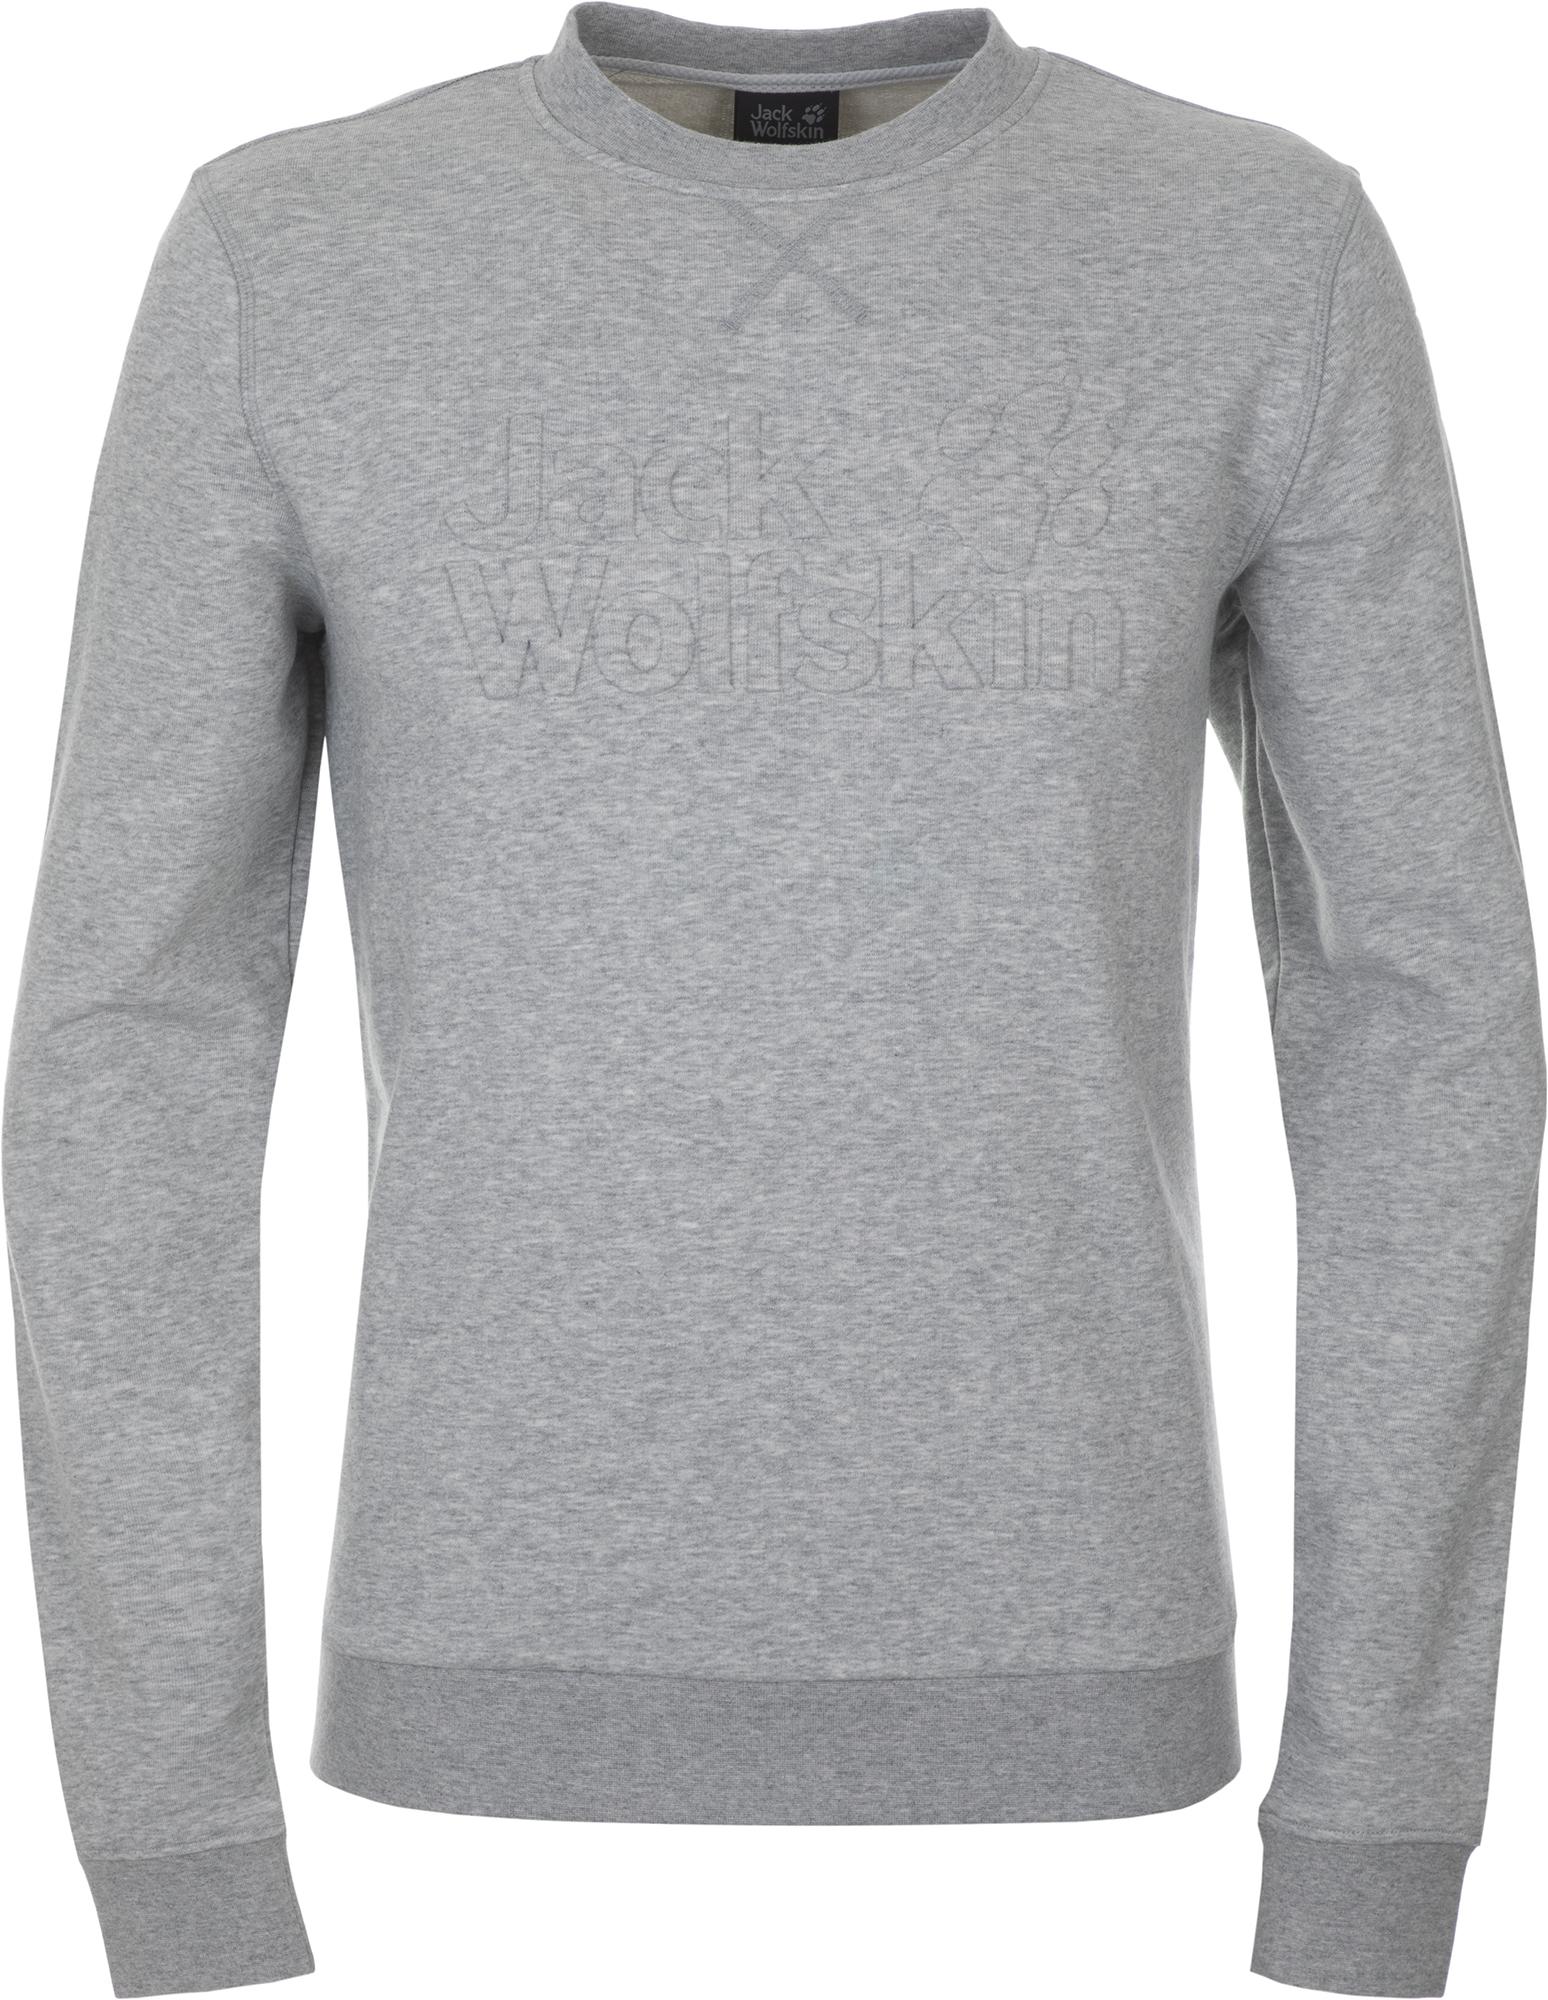 Jack Wolfskin Джемпер мужской JACK WOLFSKIN Logo, размер 58